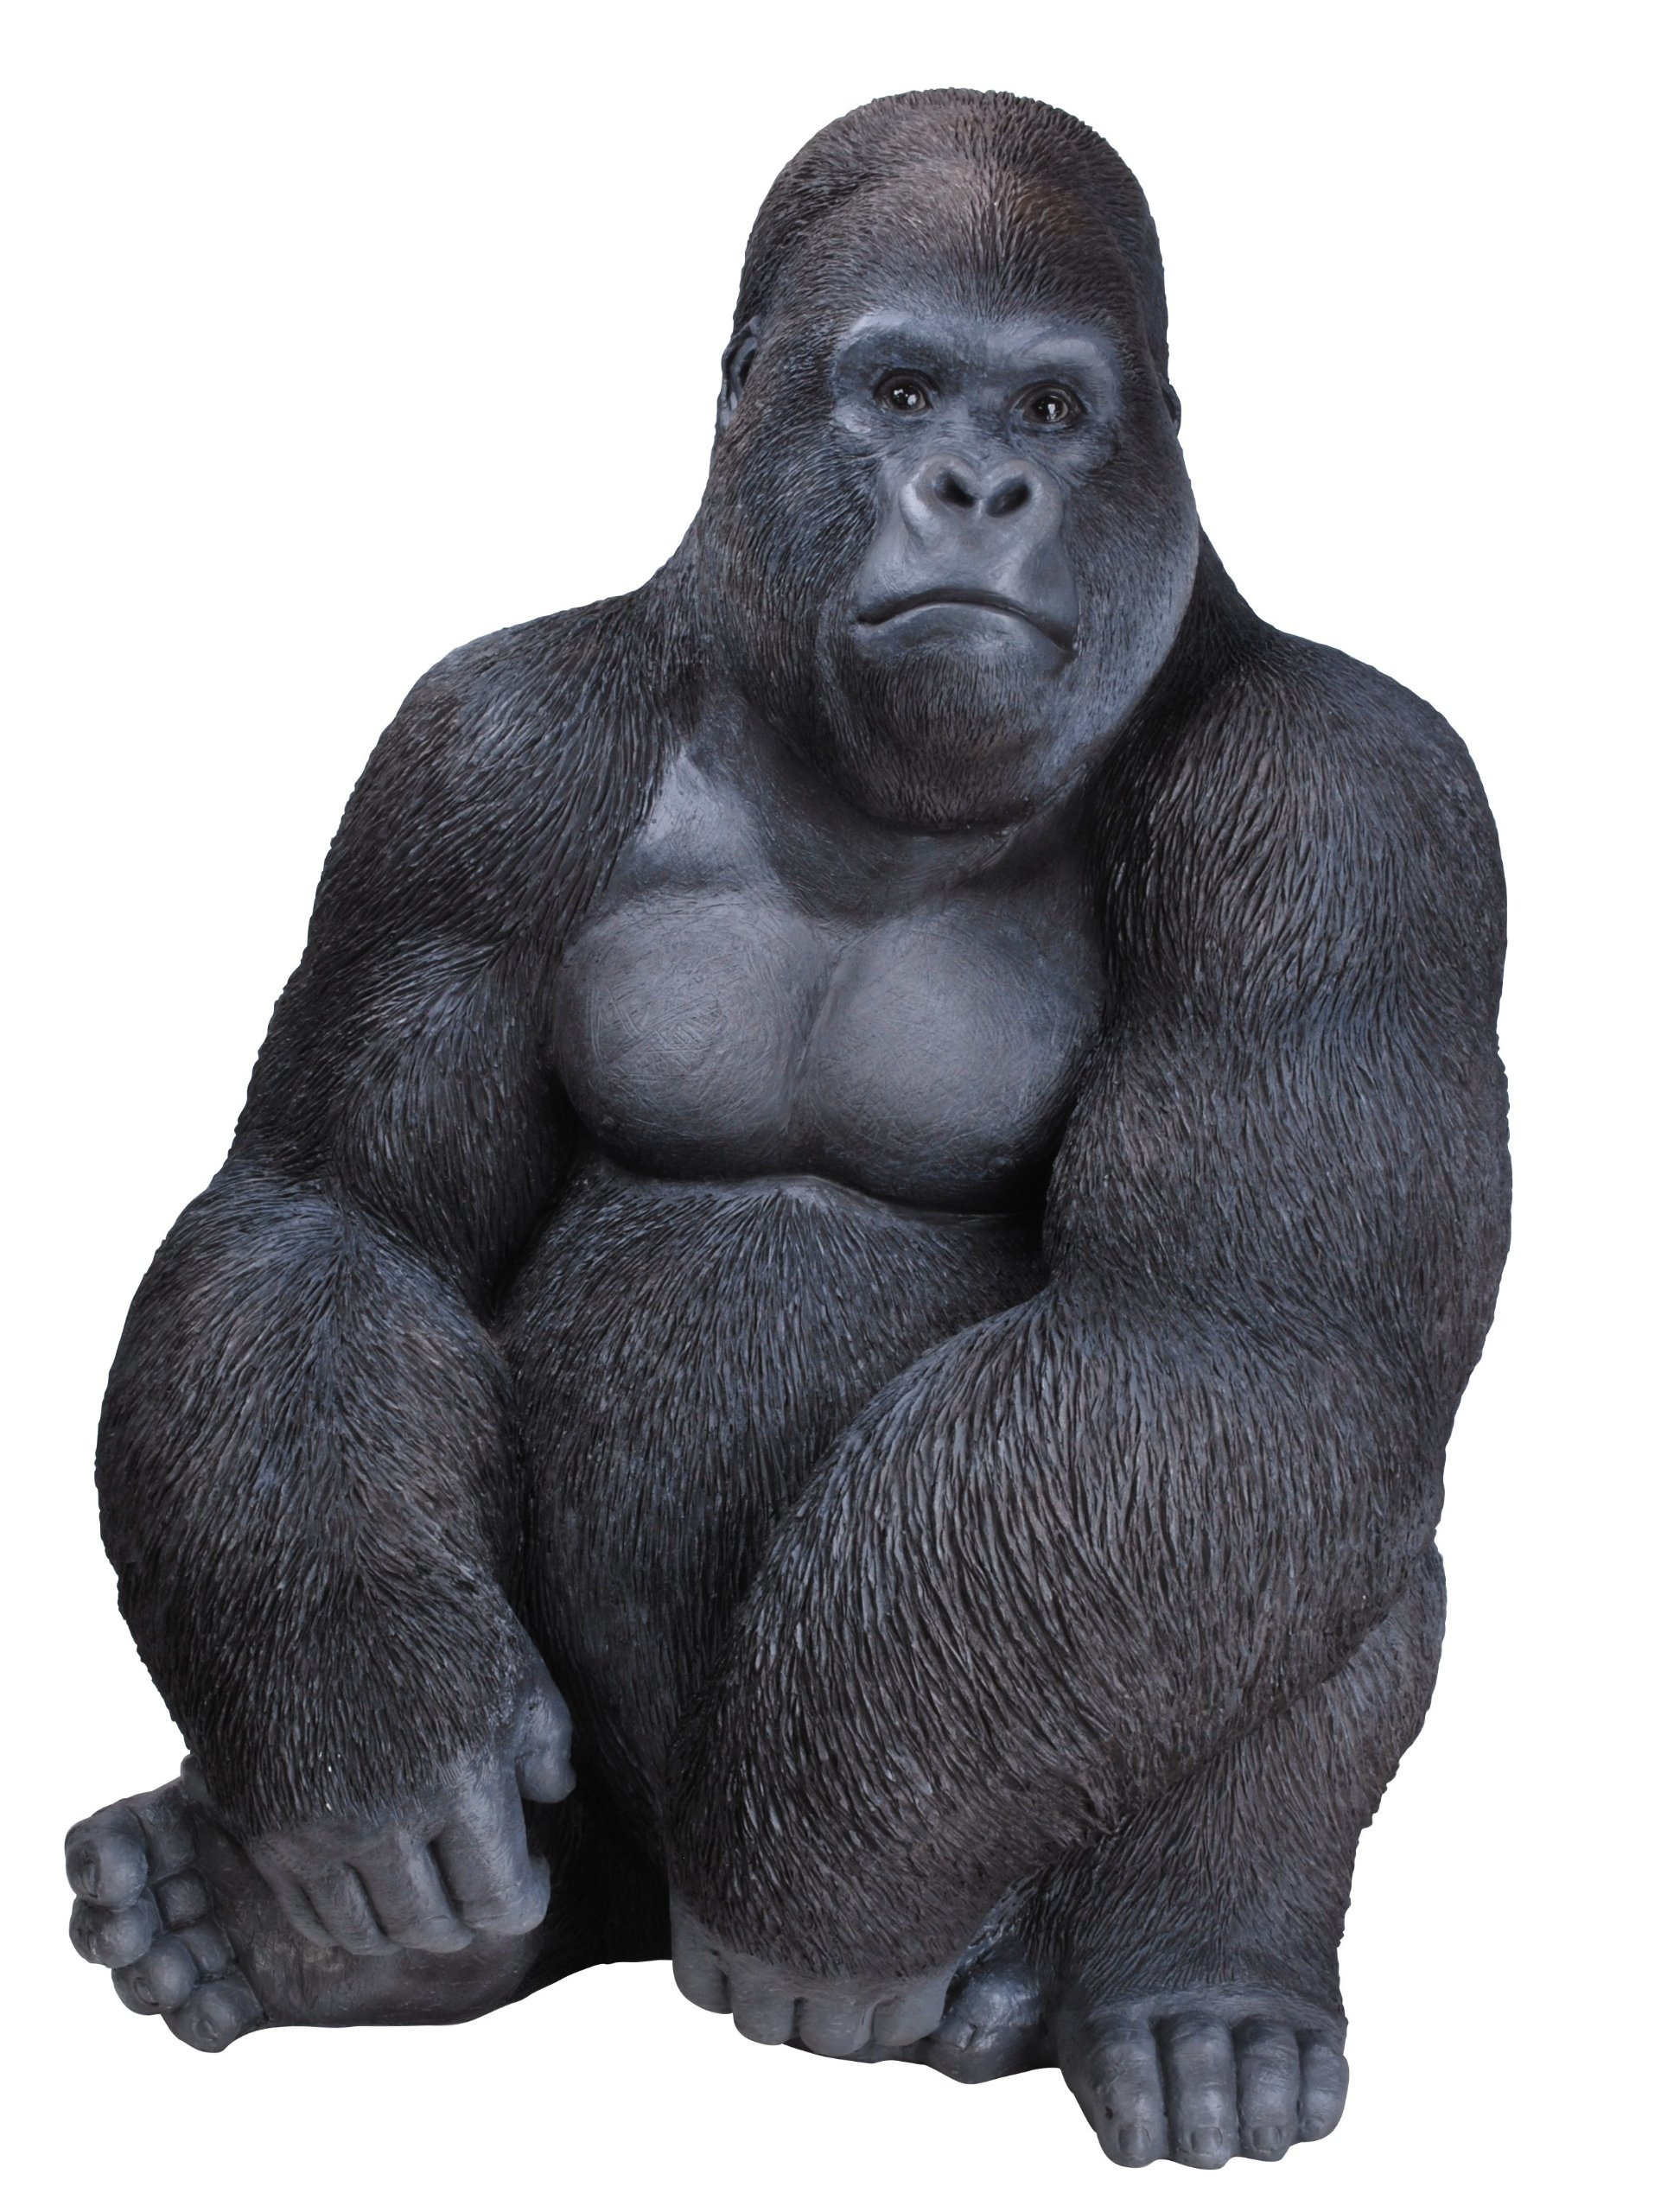 Gorilla sculpture Resin Large Detailed Garden Ornament 54cm Silver Back